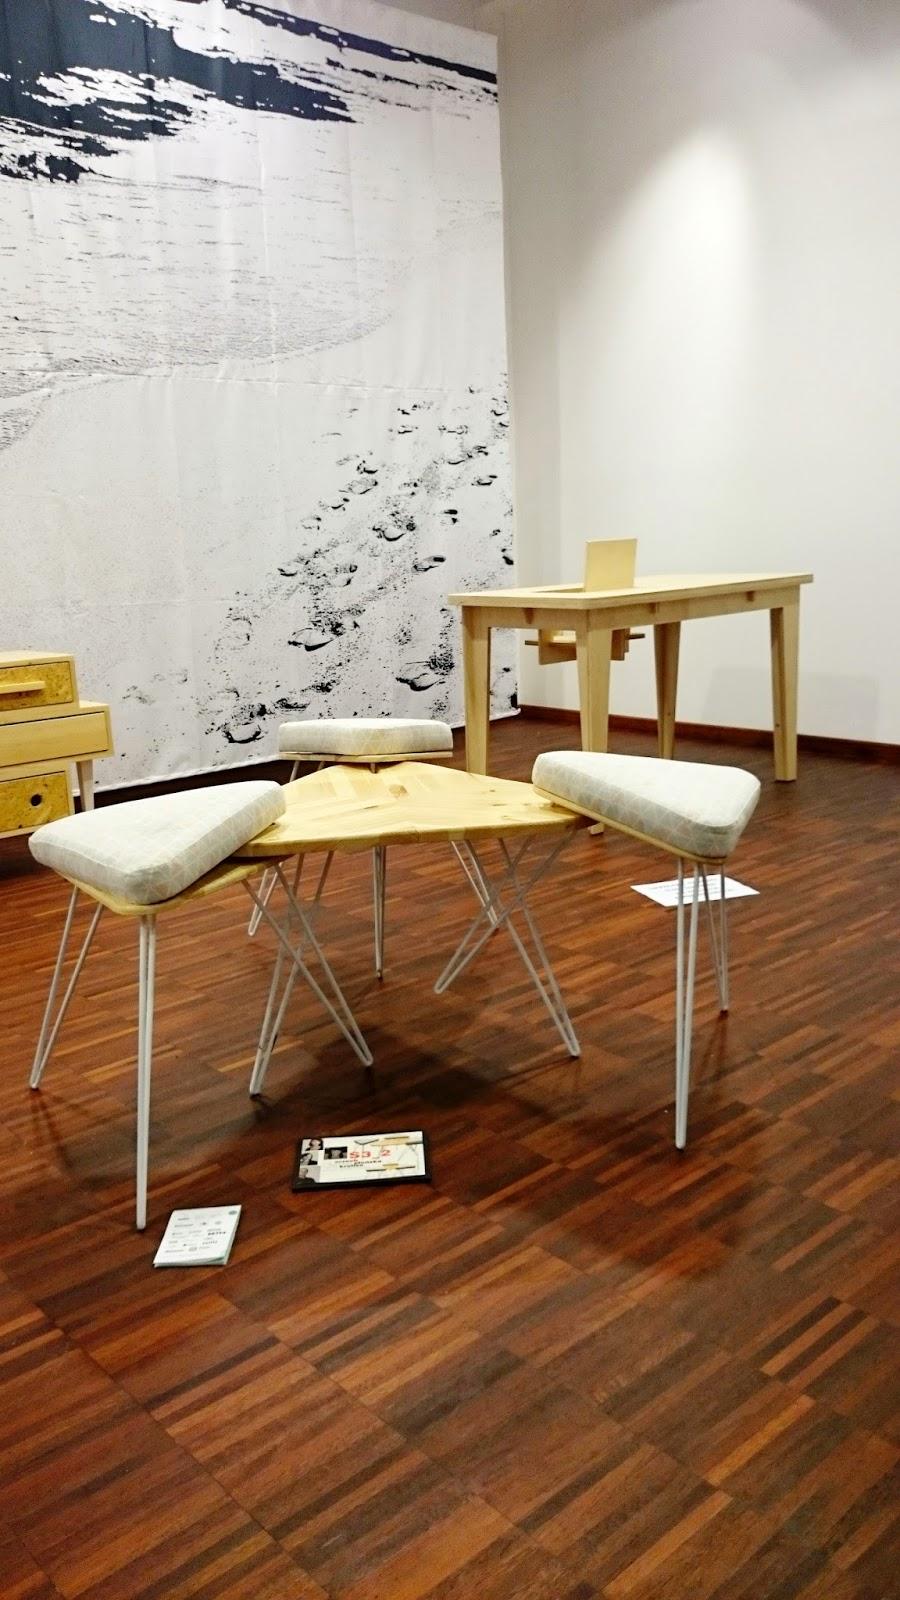 konkurs ELLE Decoration,multi mebel,GDD,Gdynia,ekodesign,designerski stolik,projektabt,młodzi projektanci Gdynia,super stolik